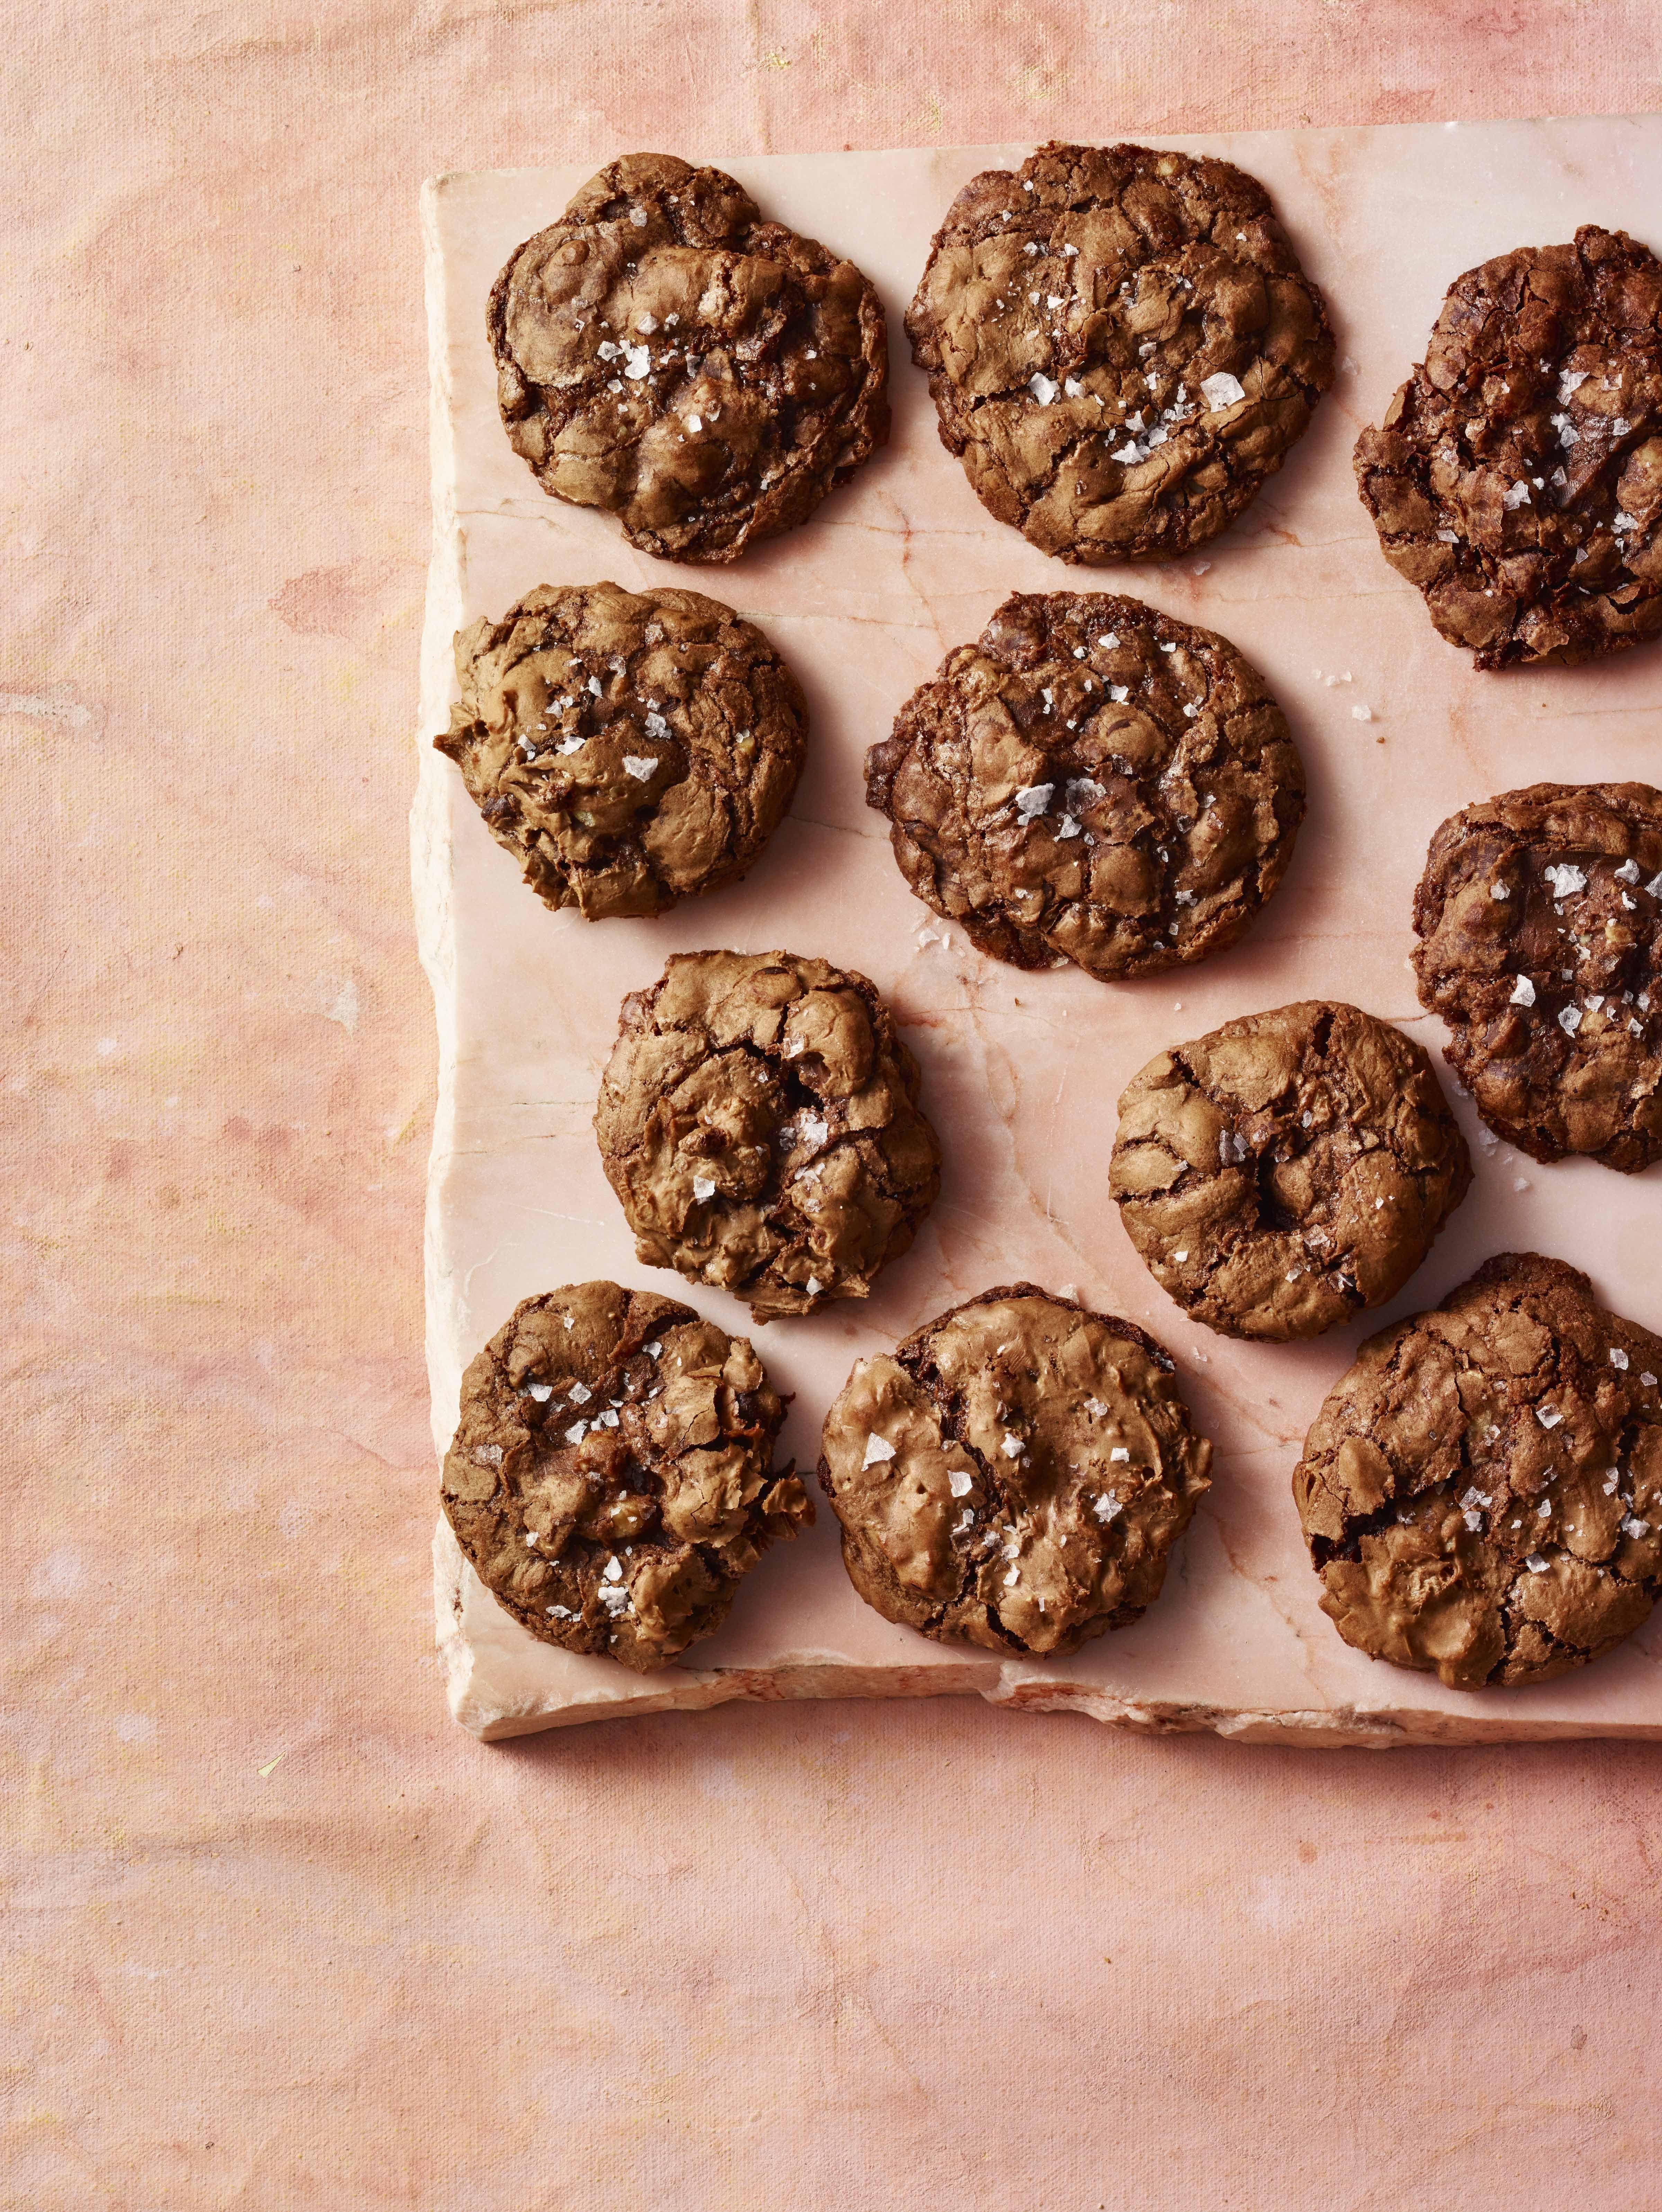 Chewy Chocolate-Walnut Cookies